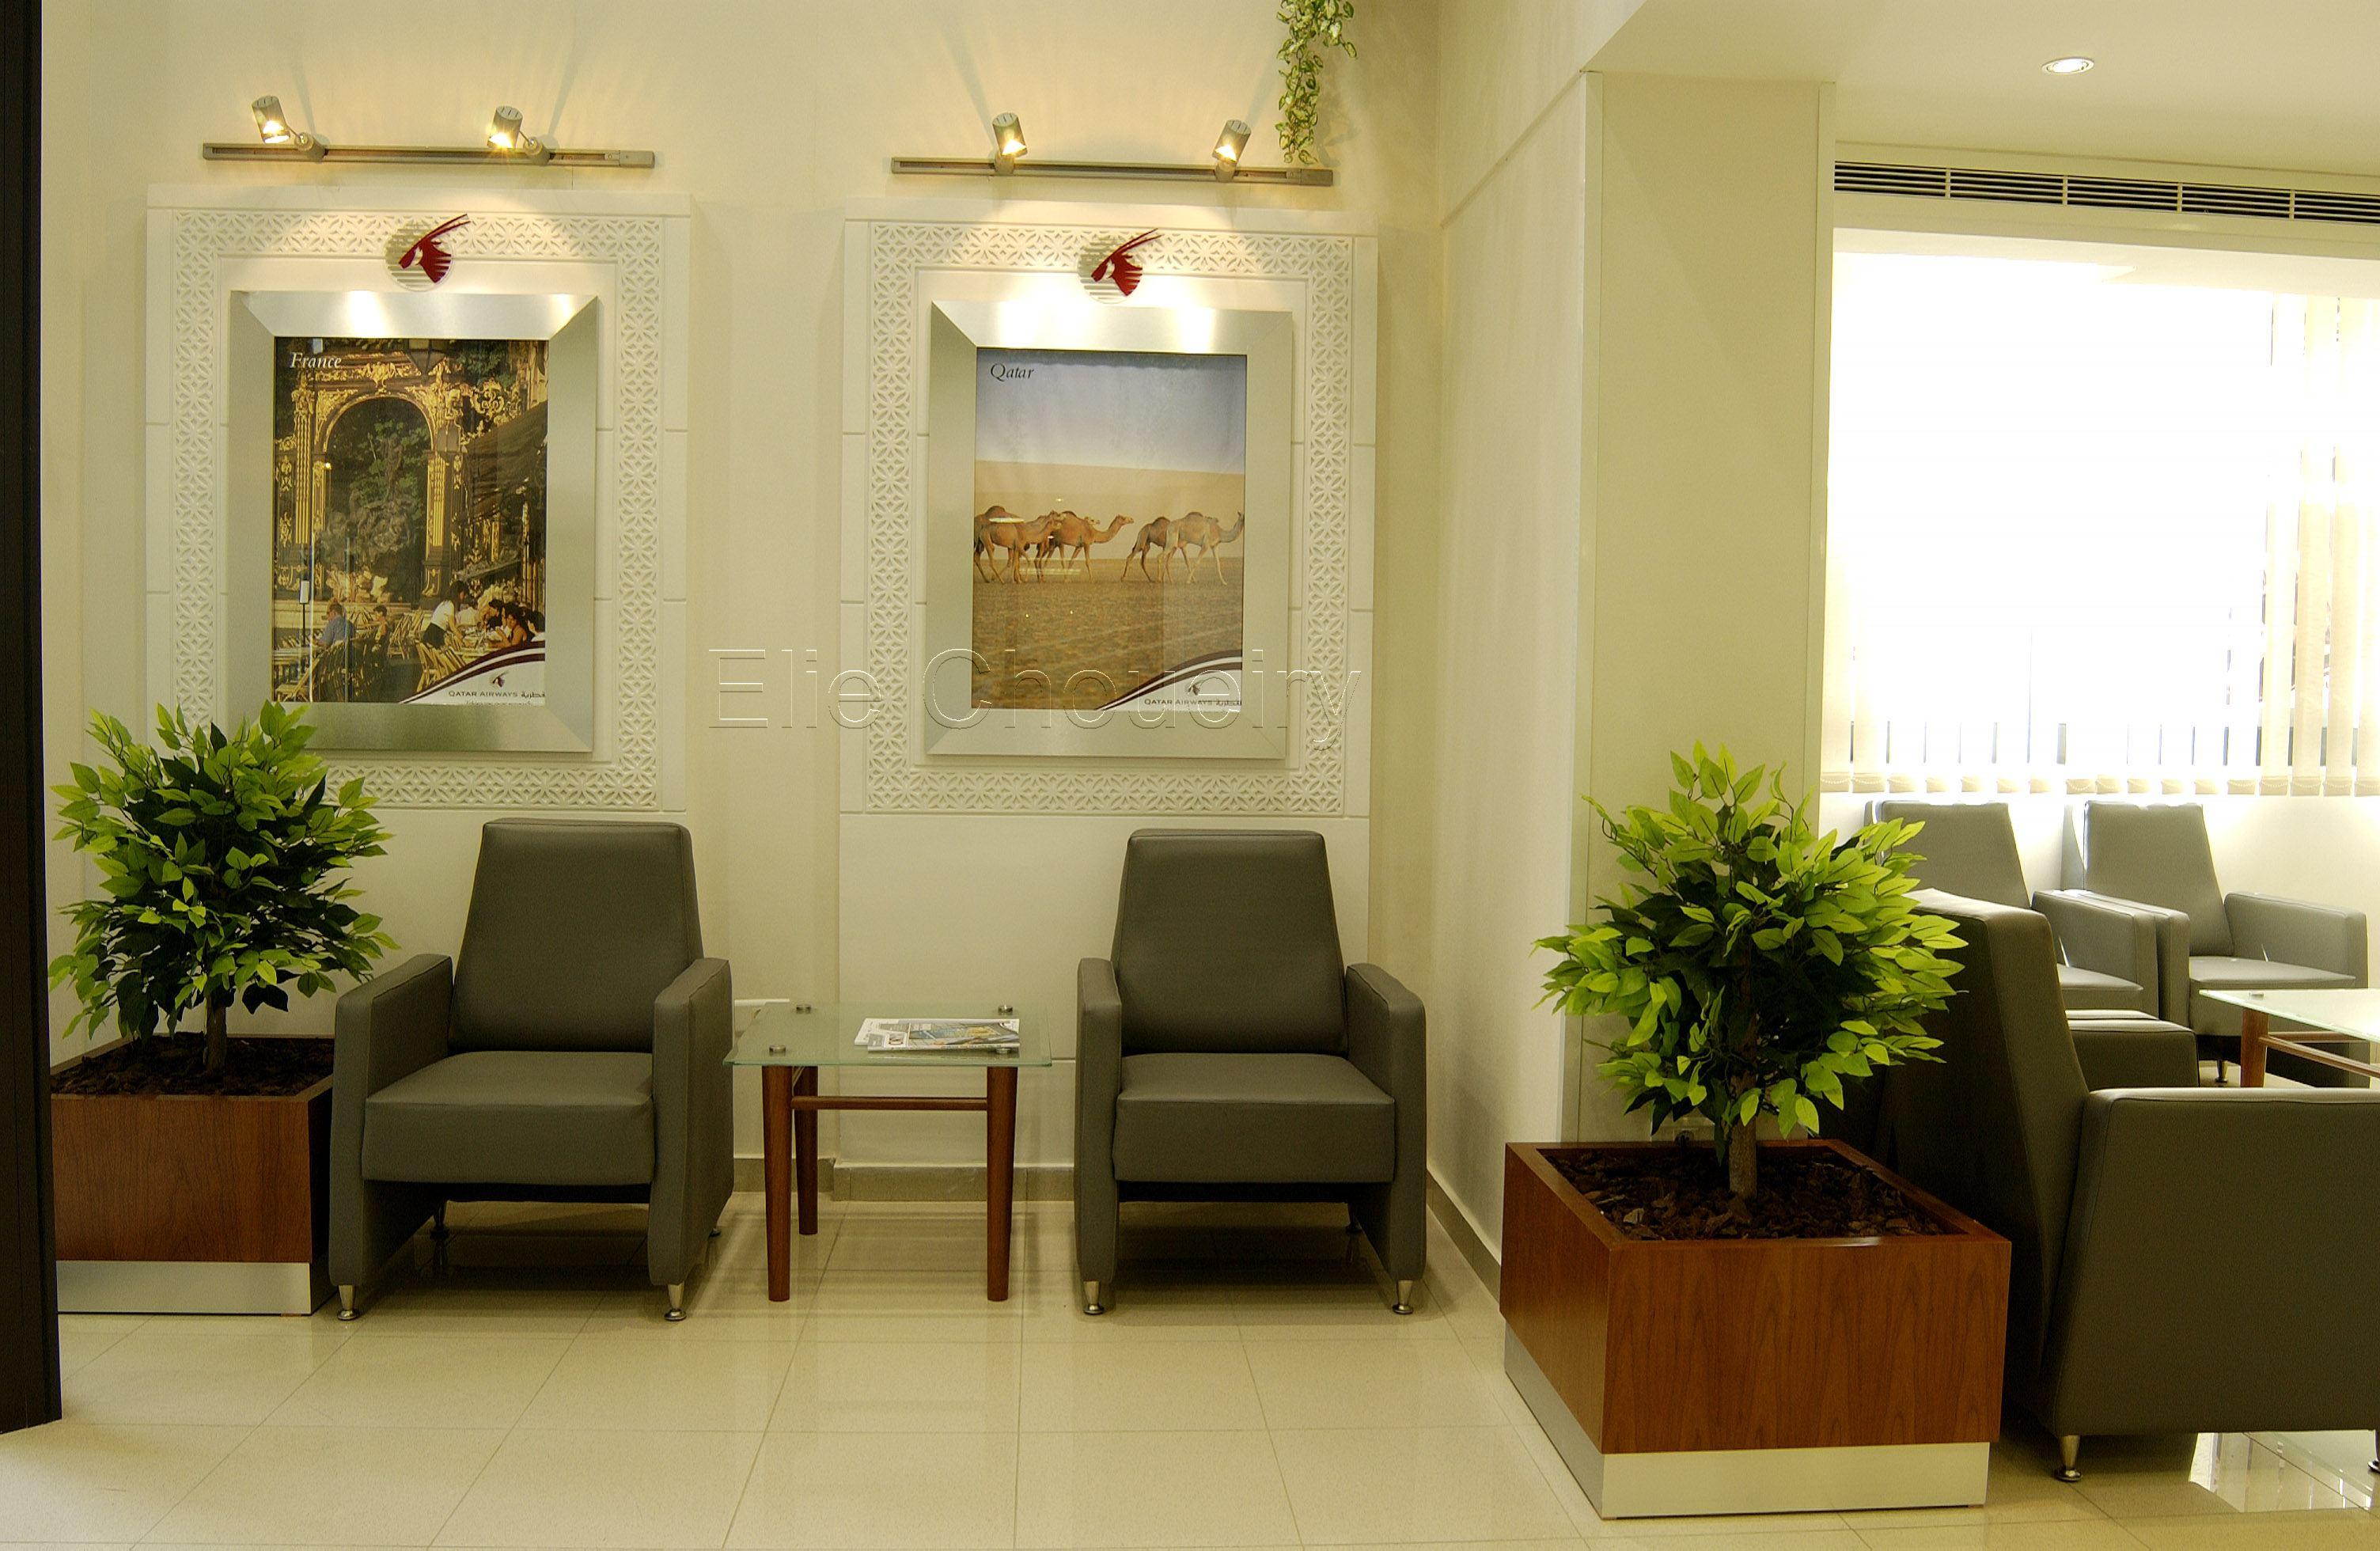 Elie choueiry interior architects lebanon interior for Interior design jobs in lebanon